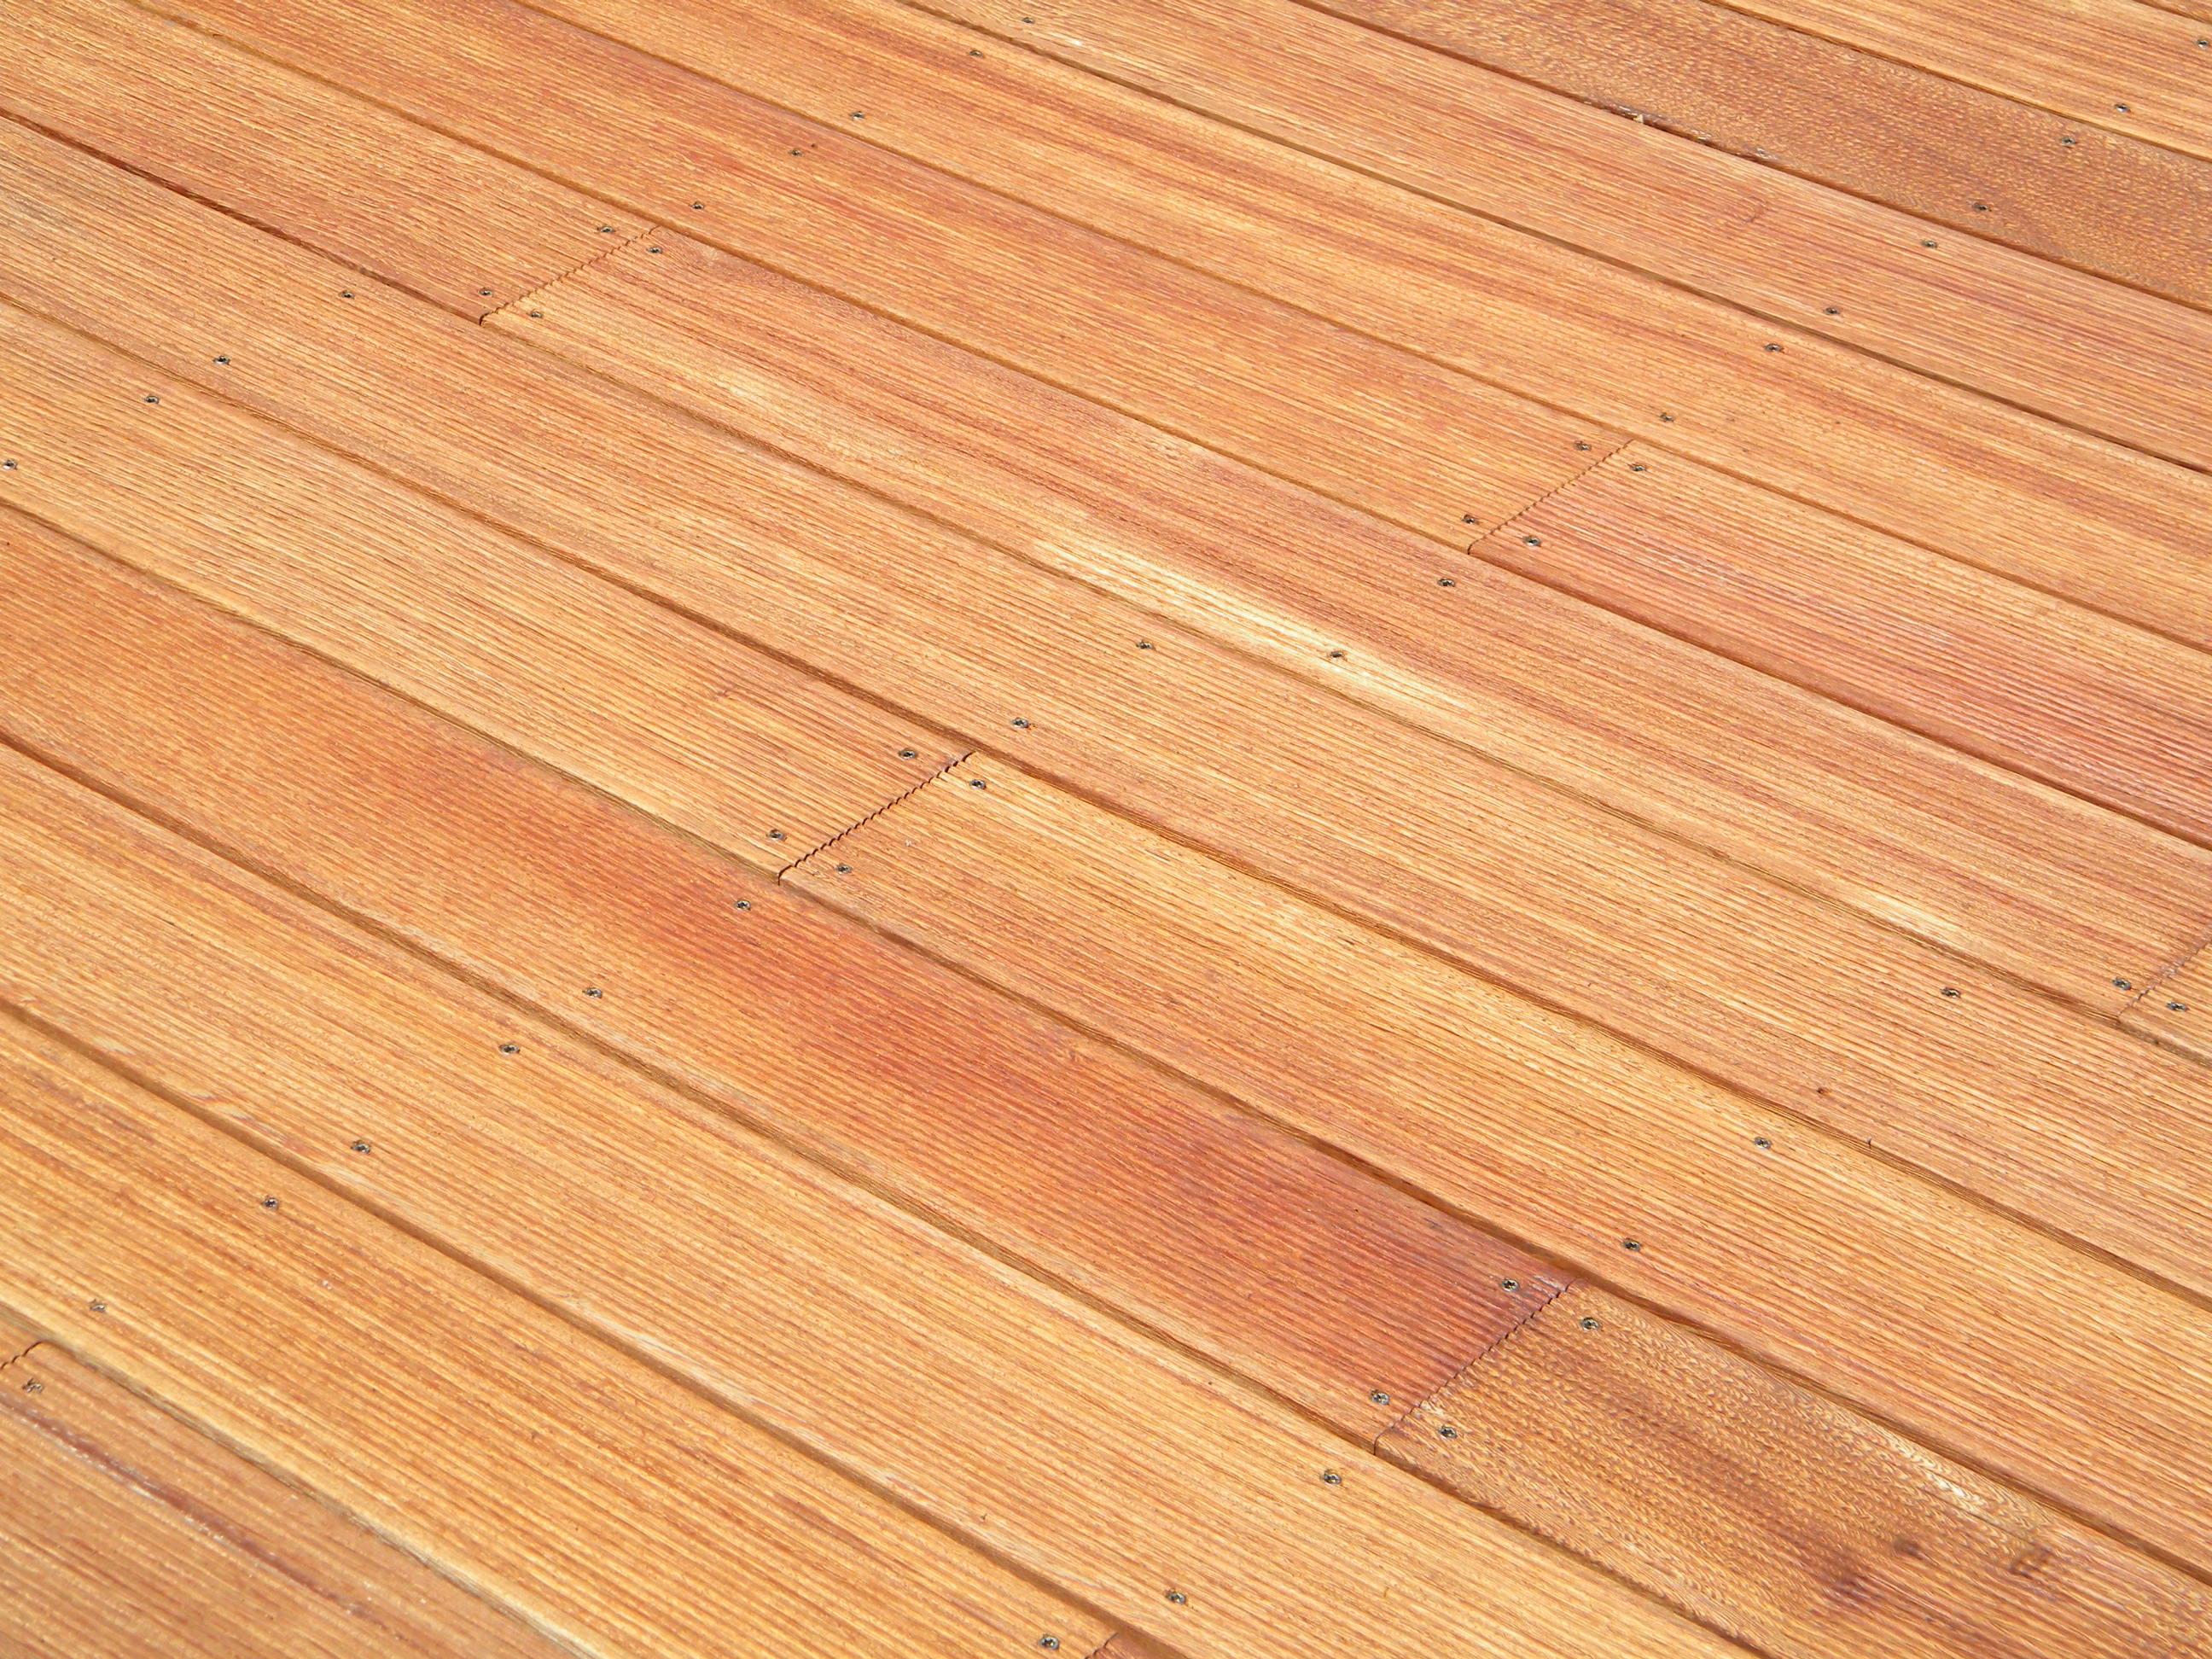 Deck-uri lemn - Angelim Pedra SELVA FLOORS - Poza 54